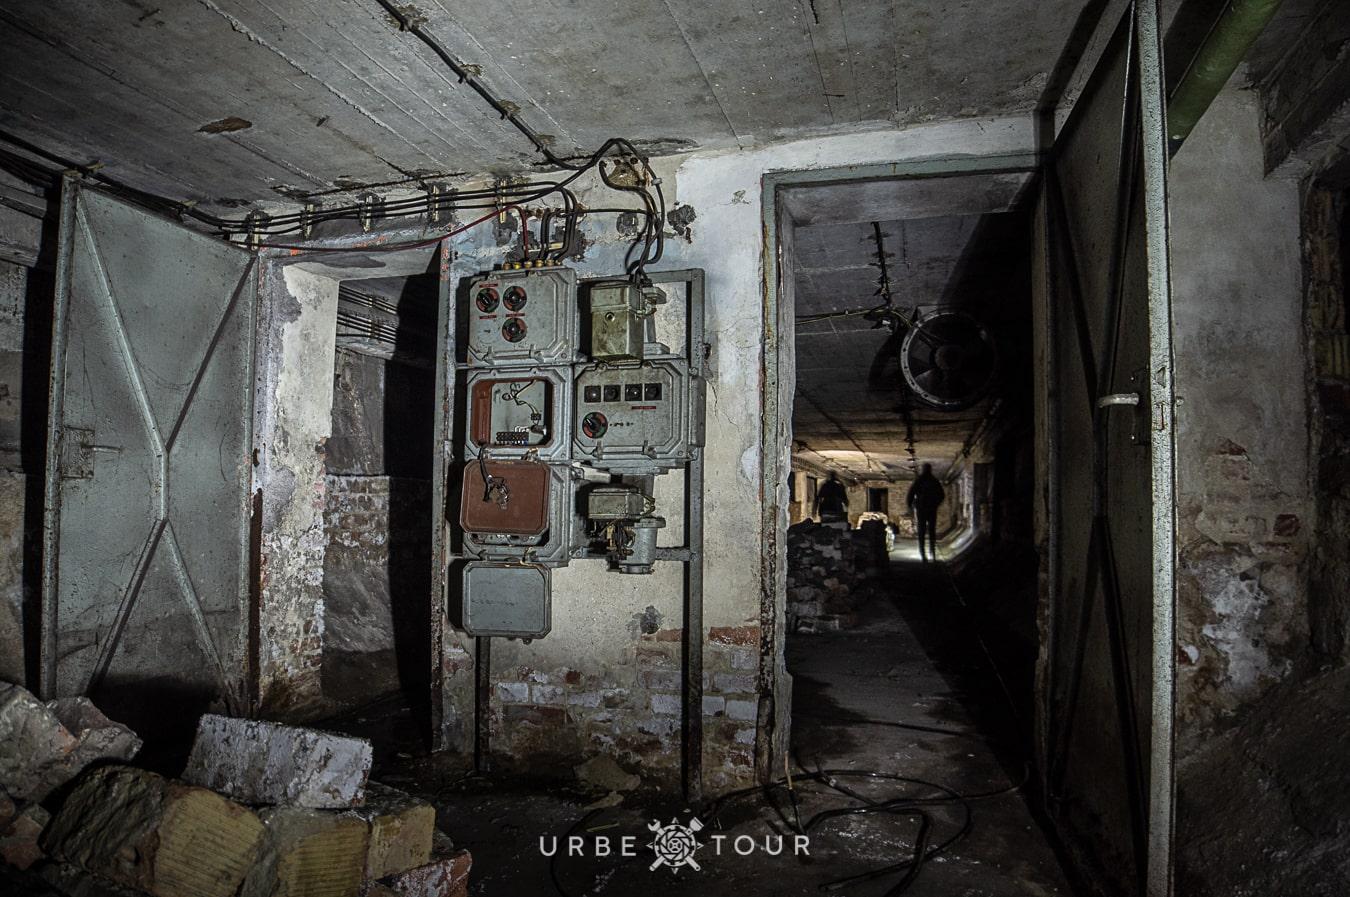 F-4-Rakosi-Bunker-budapest-8 Спецобъект Ф-4 - бункер коммуниста Ракоси в центре Будапешта